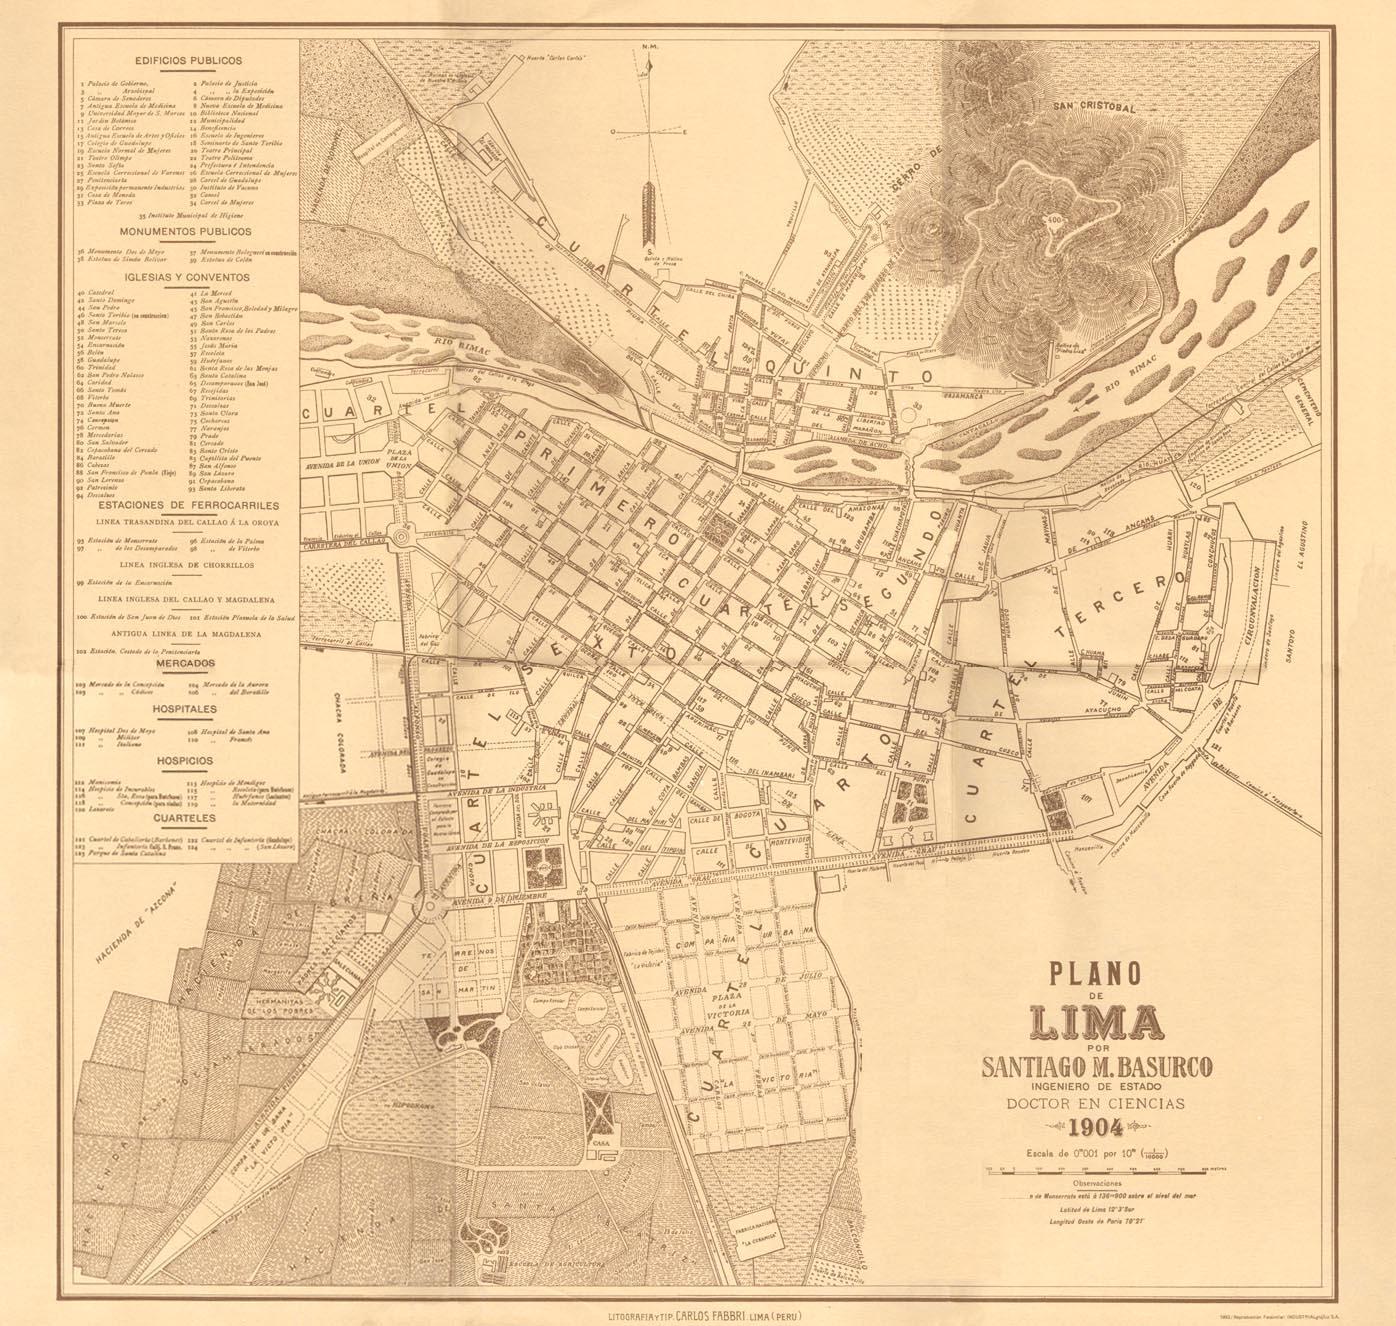 Planos De Lima Antigua Plano De Lima A O 1904 Santiago